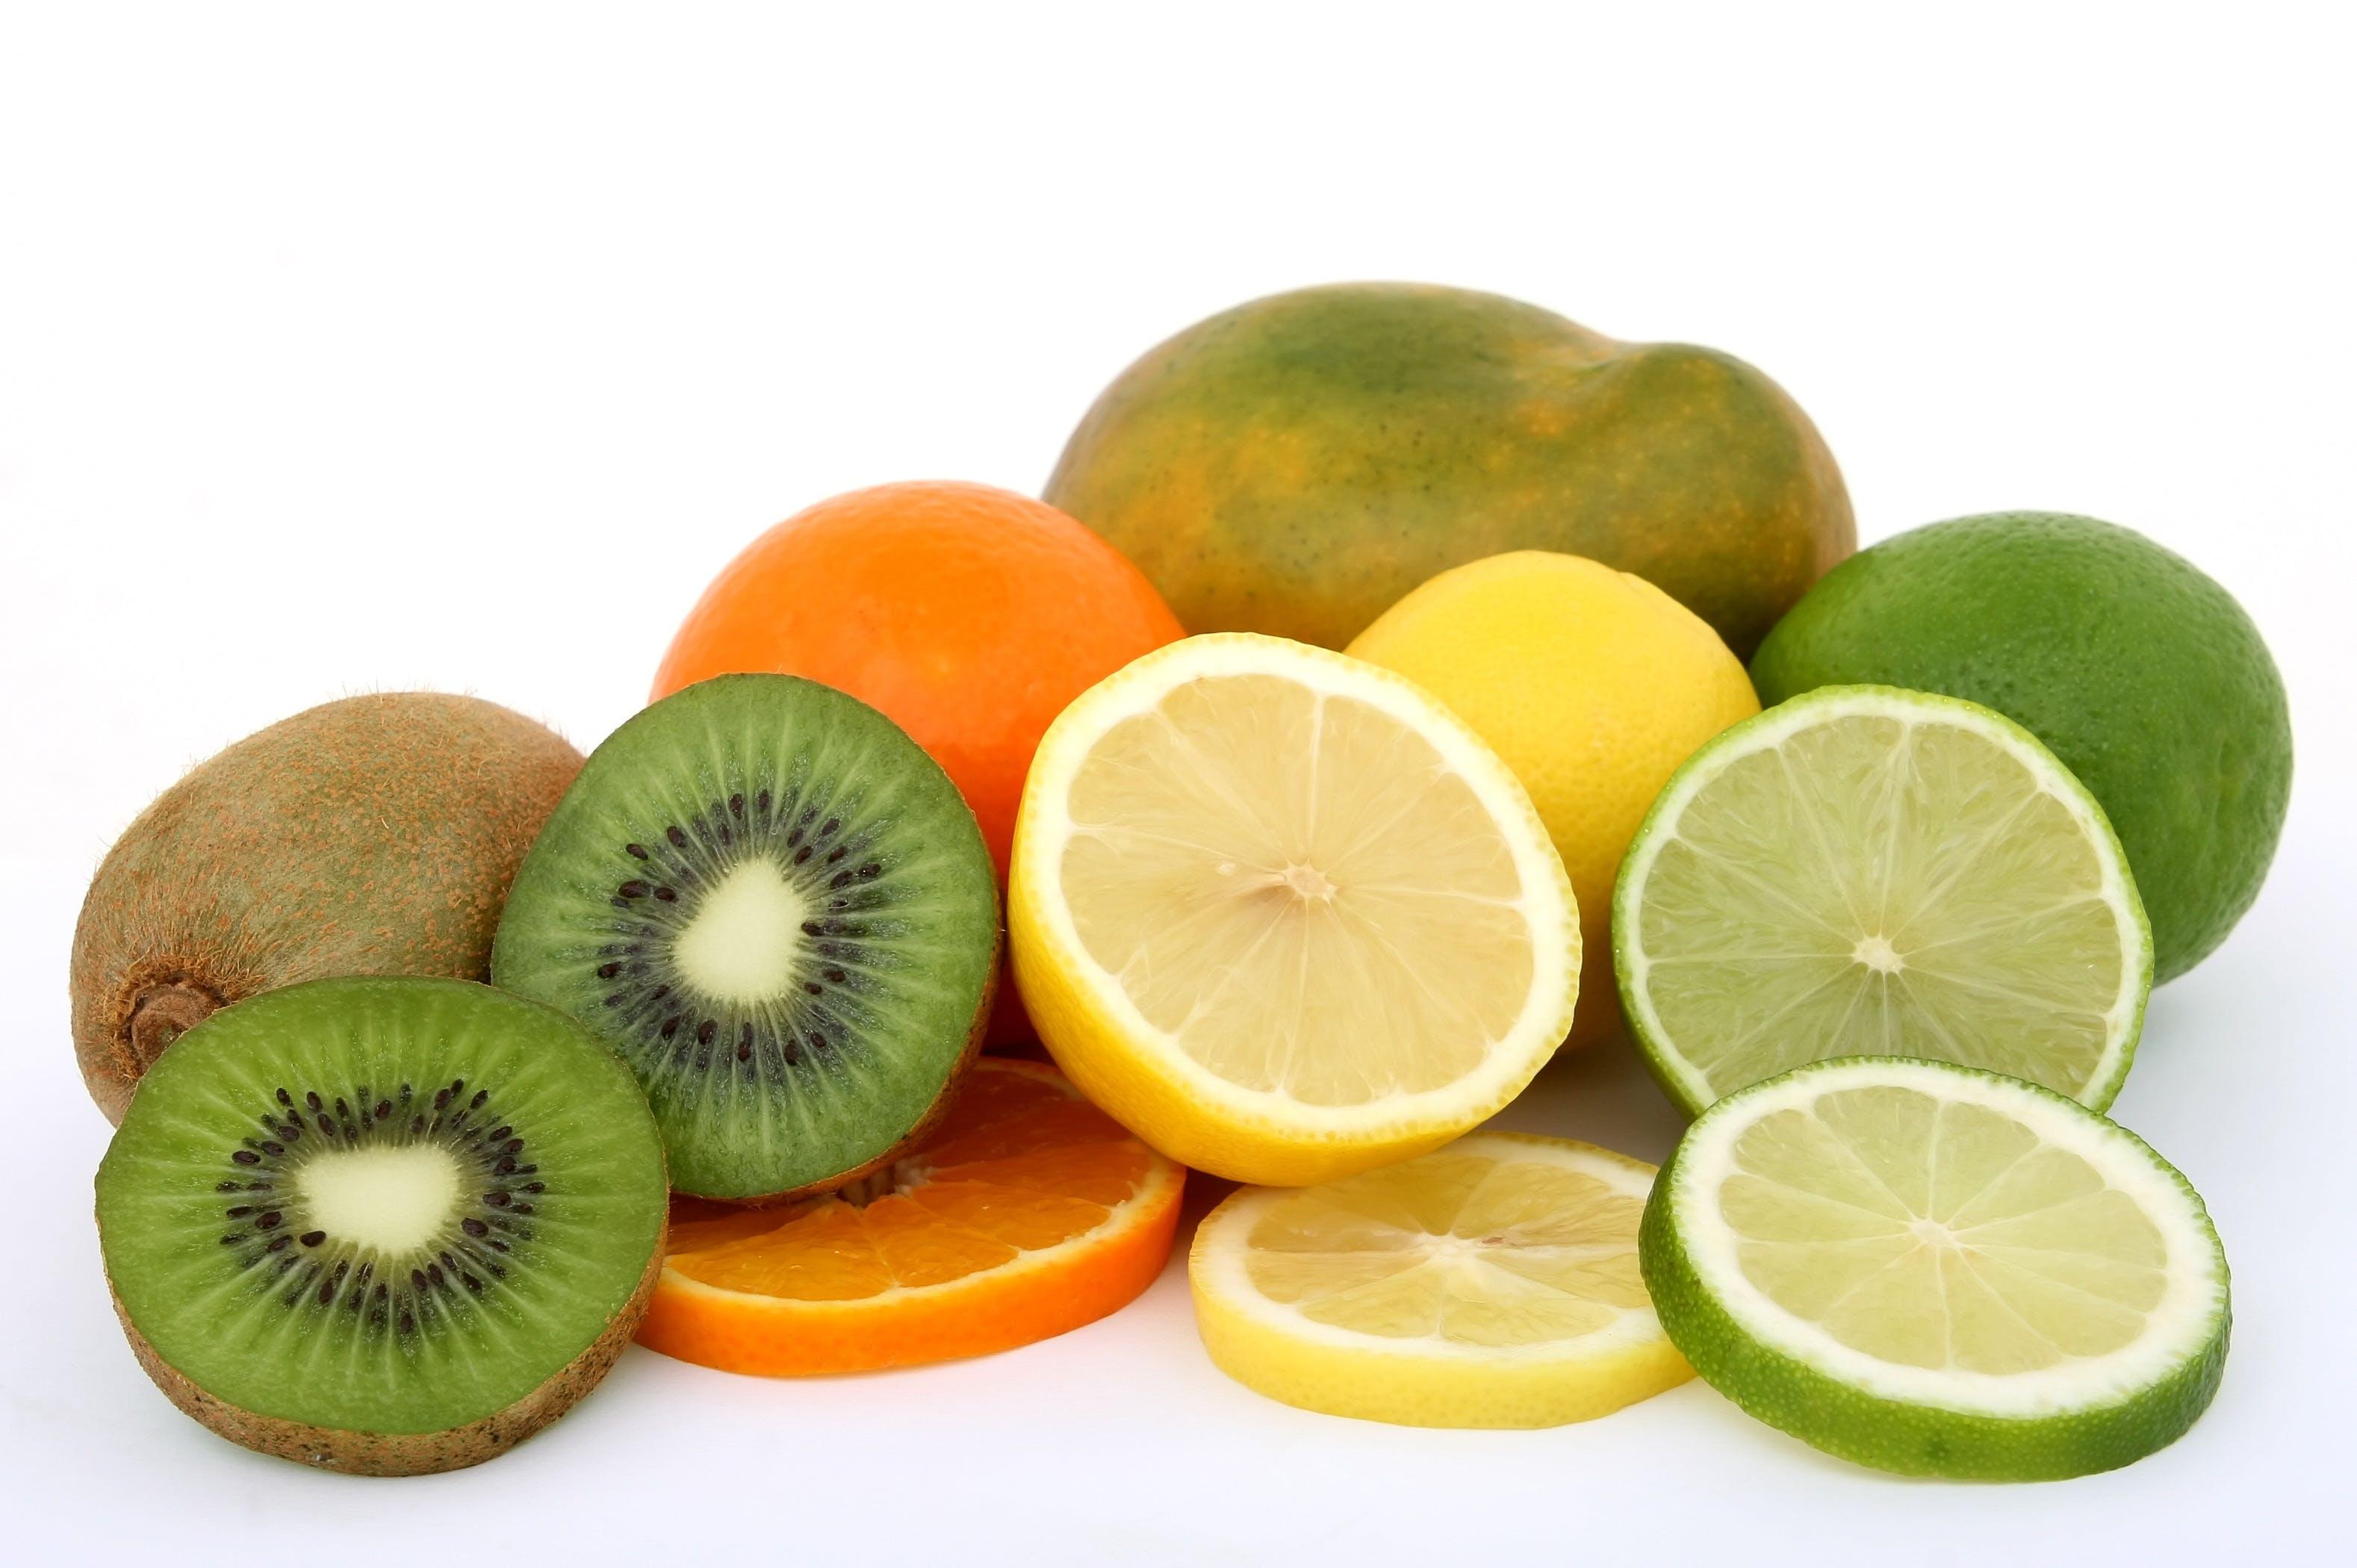 citrus, close-up, food